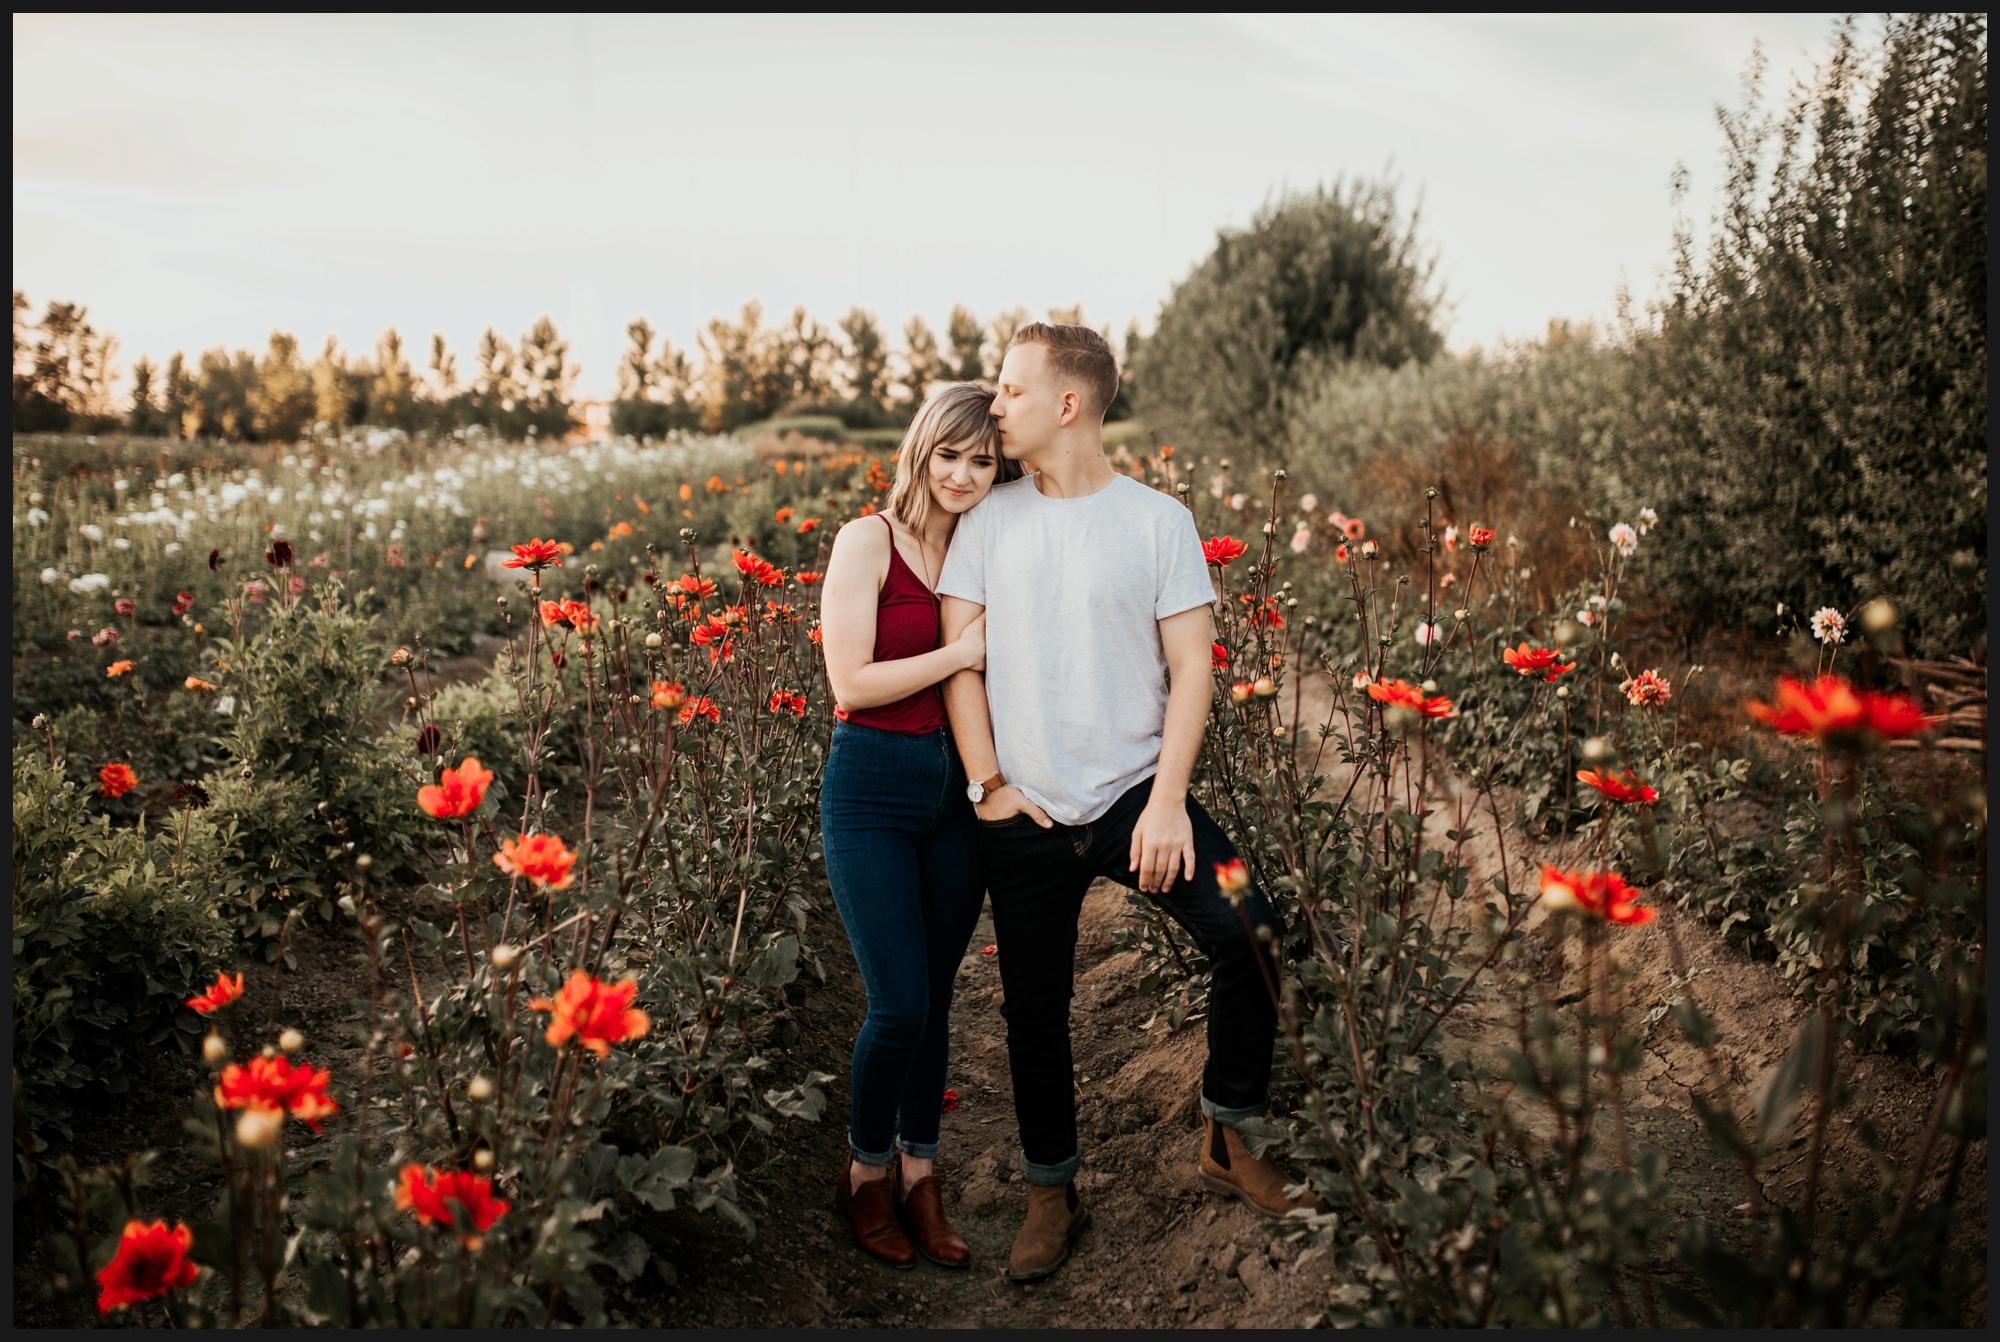 Orlando-Wedding-Photographer-destination-wedding-photographer-florida-wedding-photographer-bohemian-wedding-photographer_0279.jpg